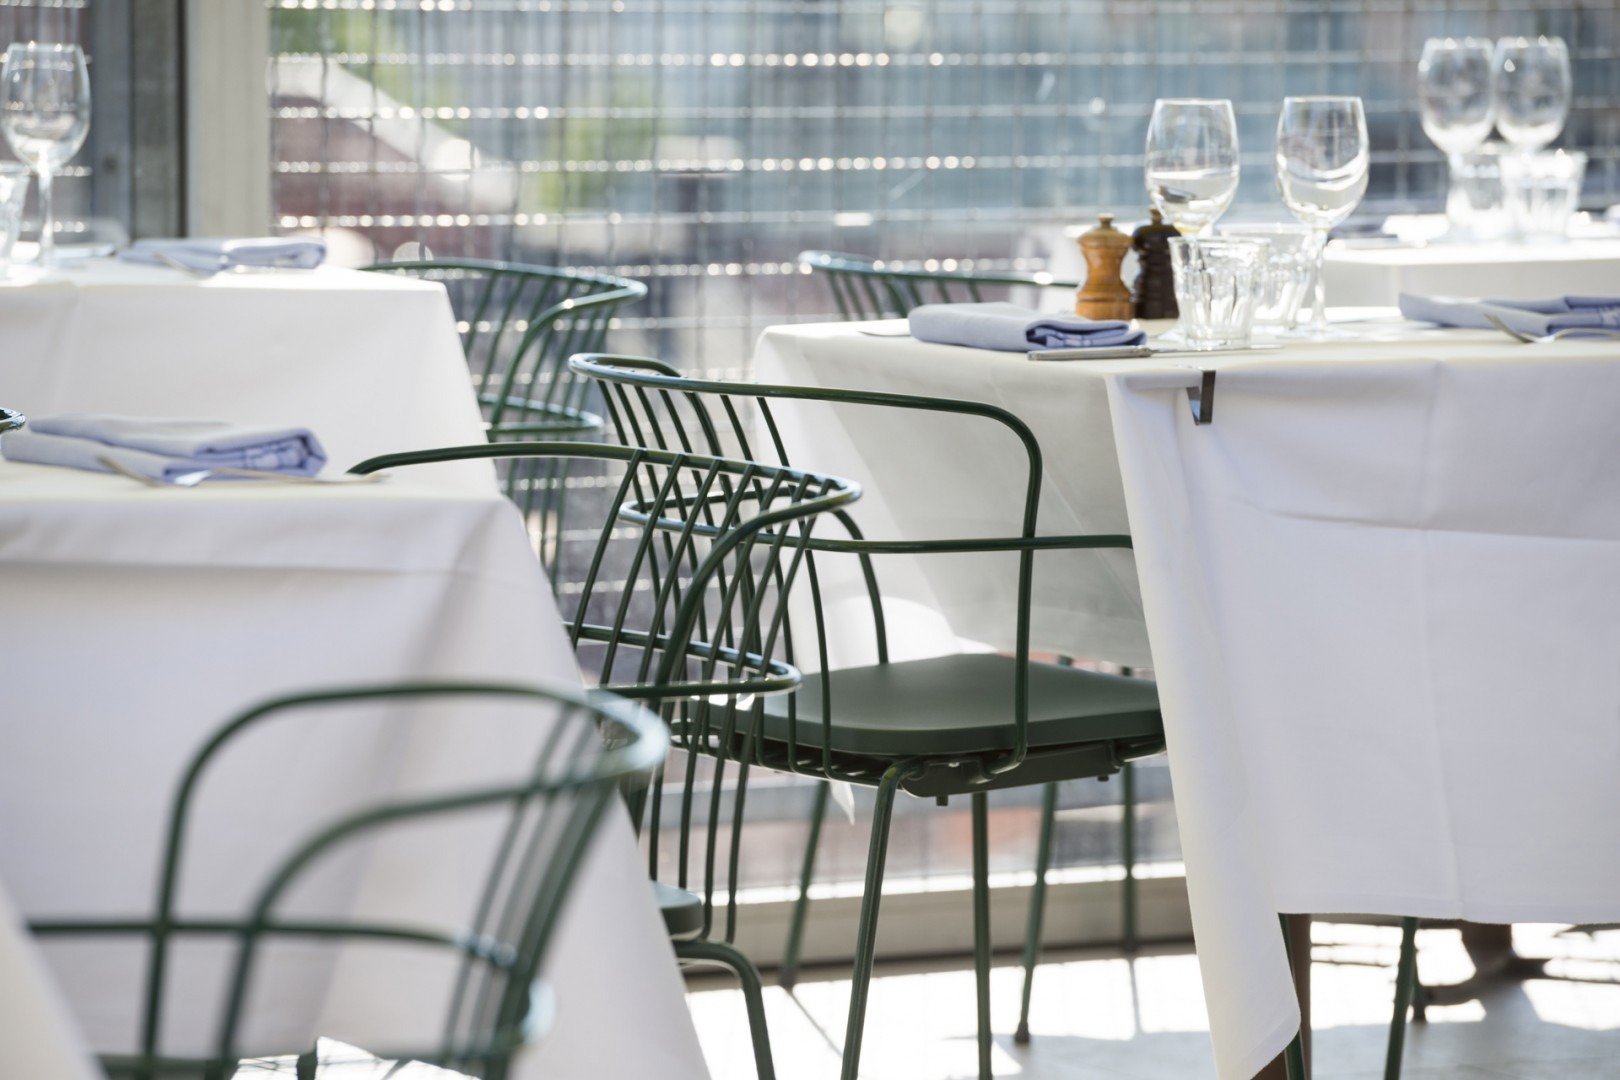 restaurant_gondolen.jpg